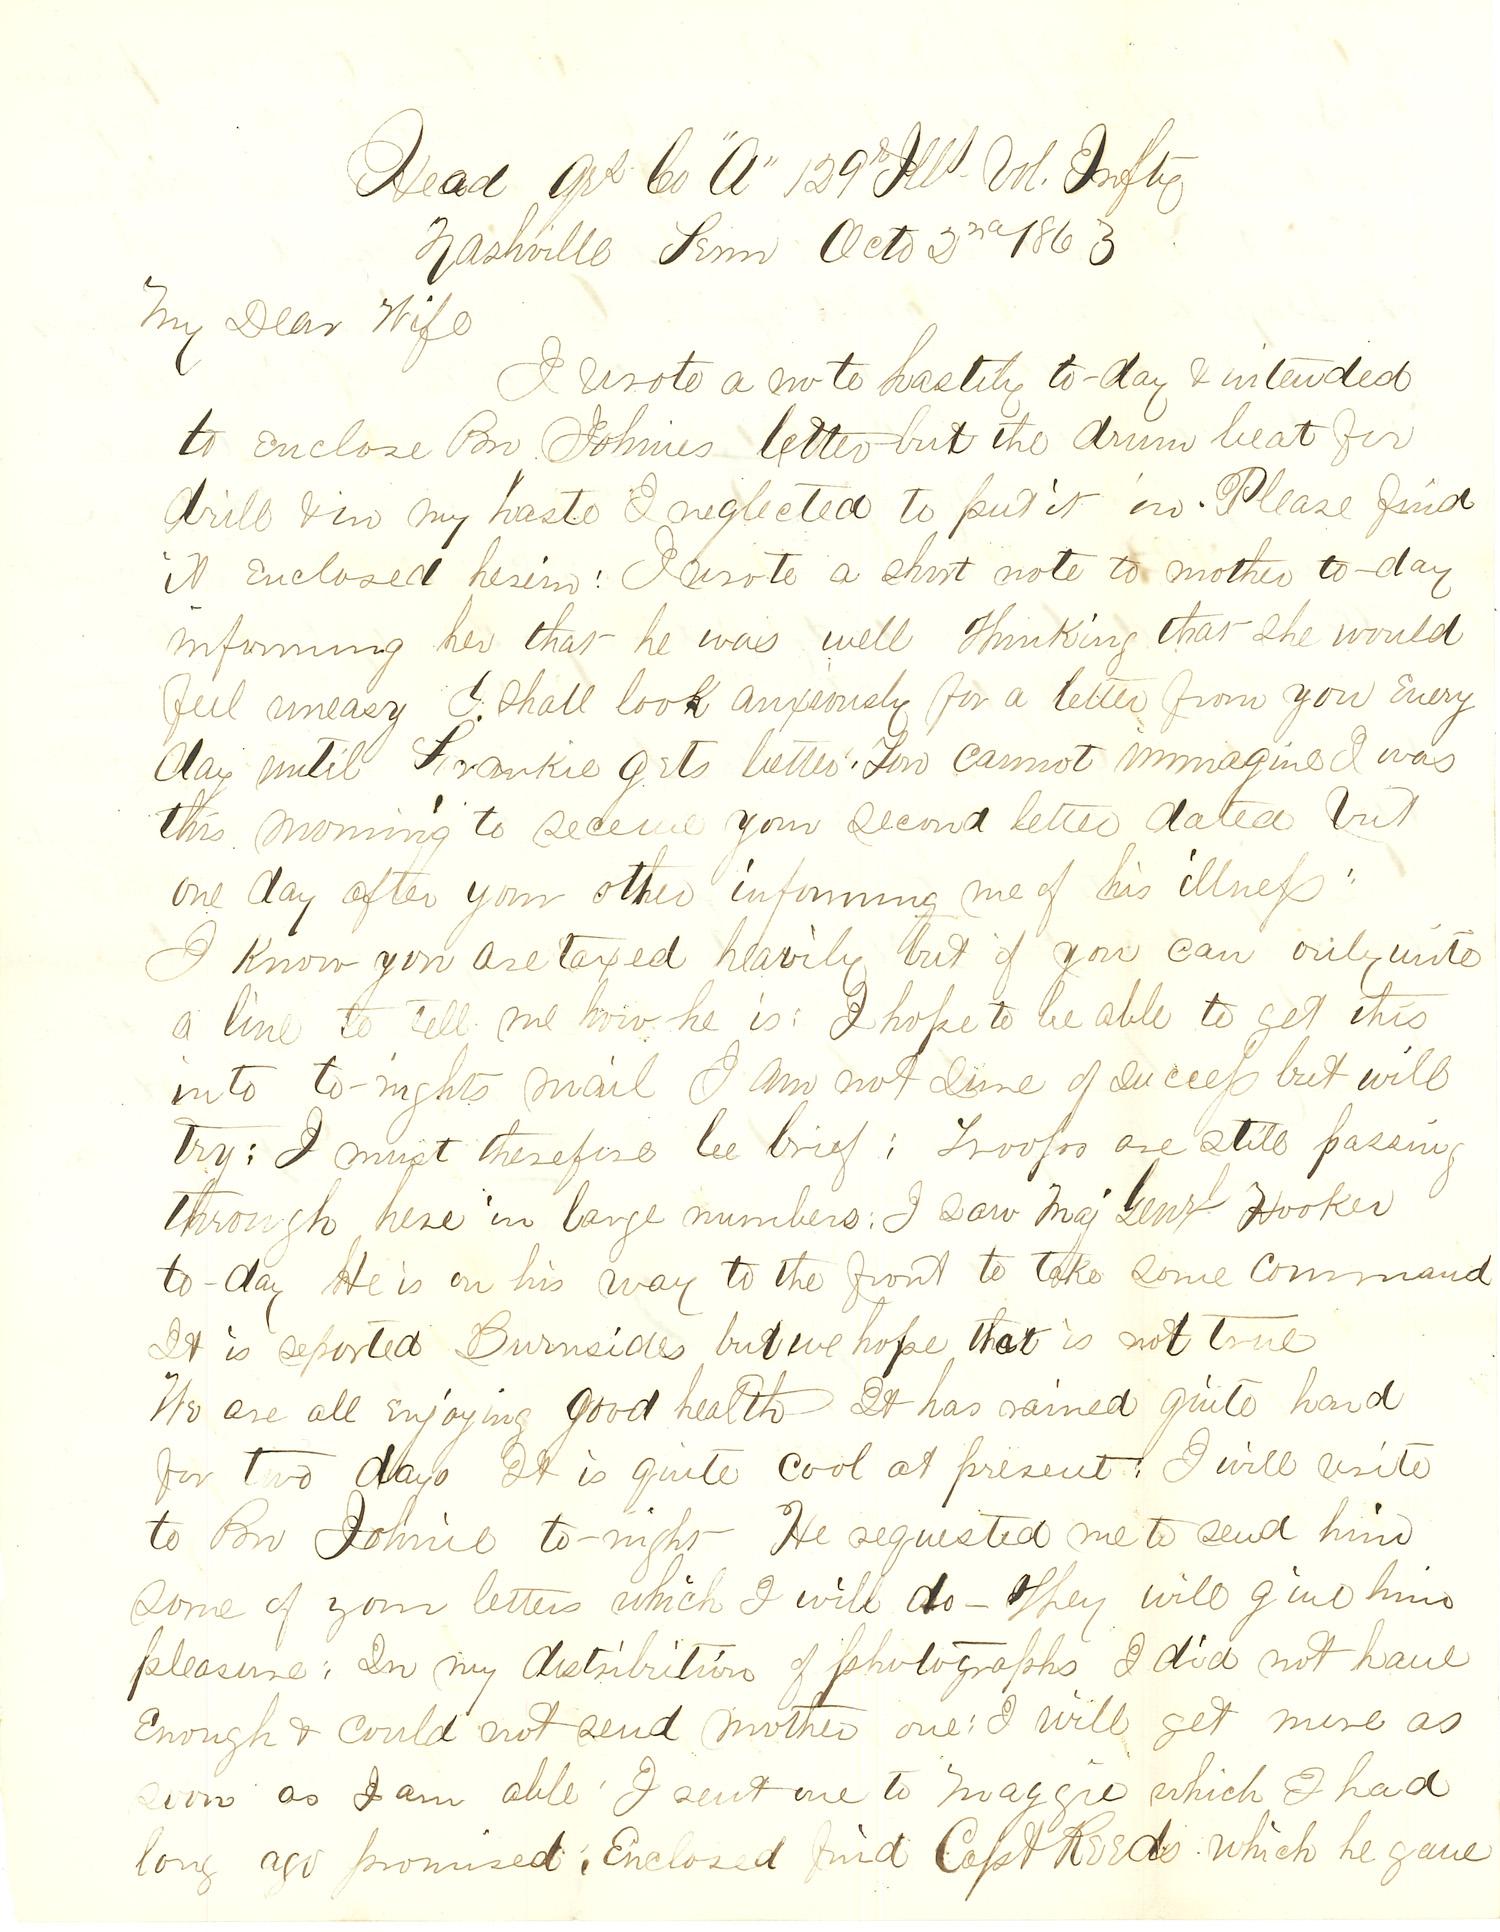 Joseph Culver Letter, October 2, 1863, Letter 2, Page 1